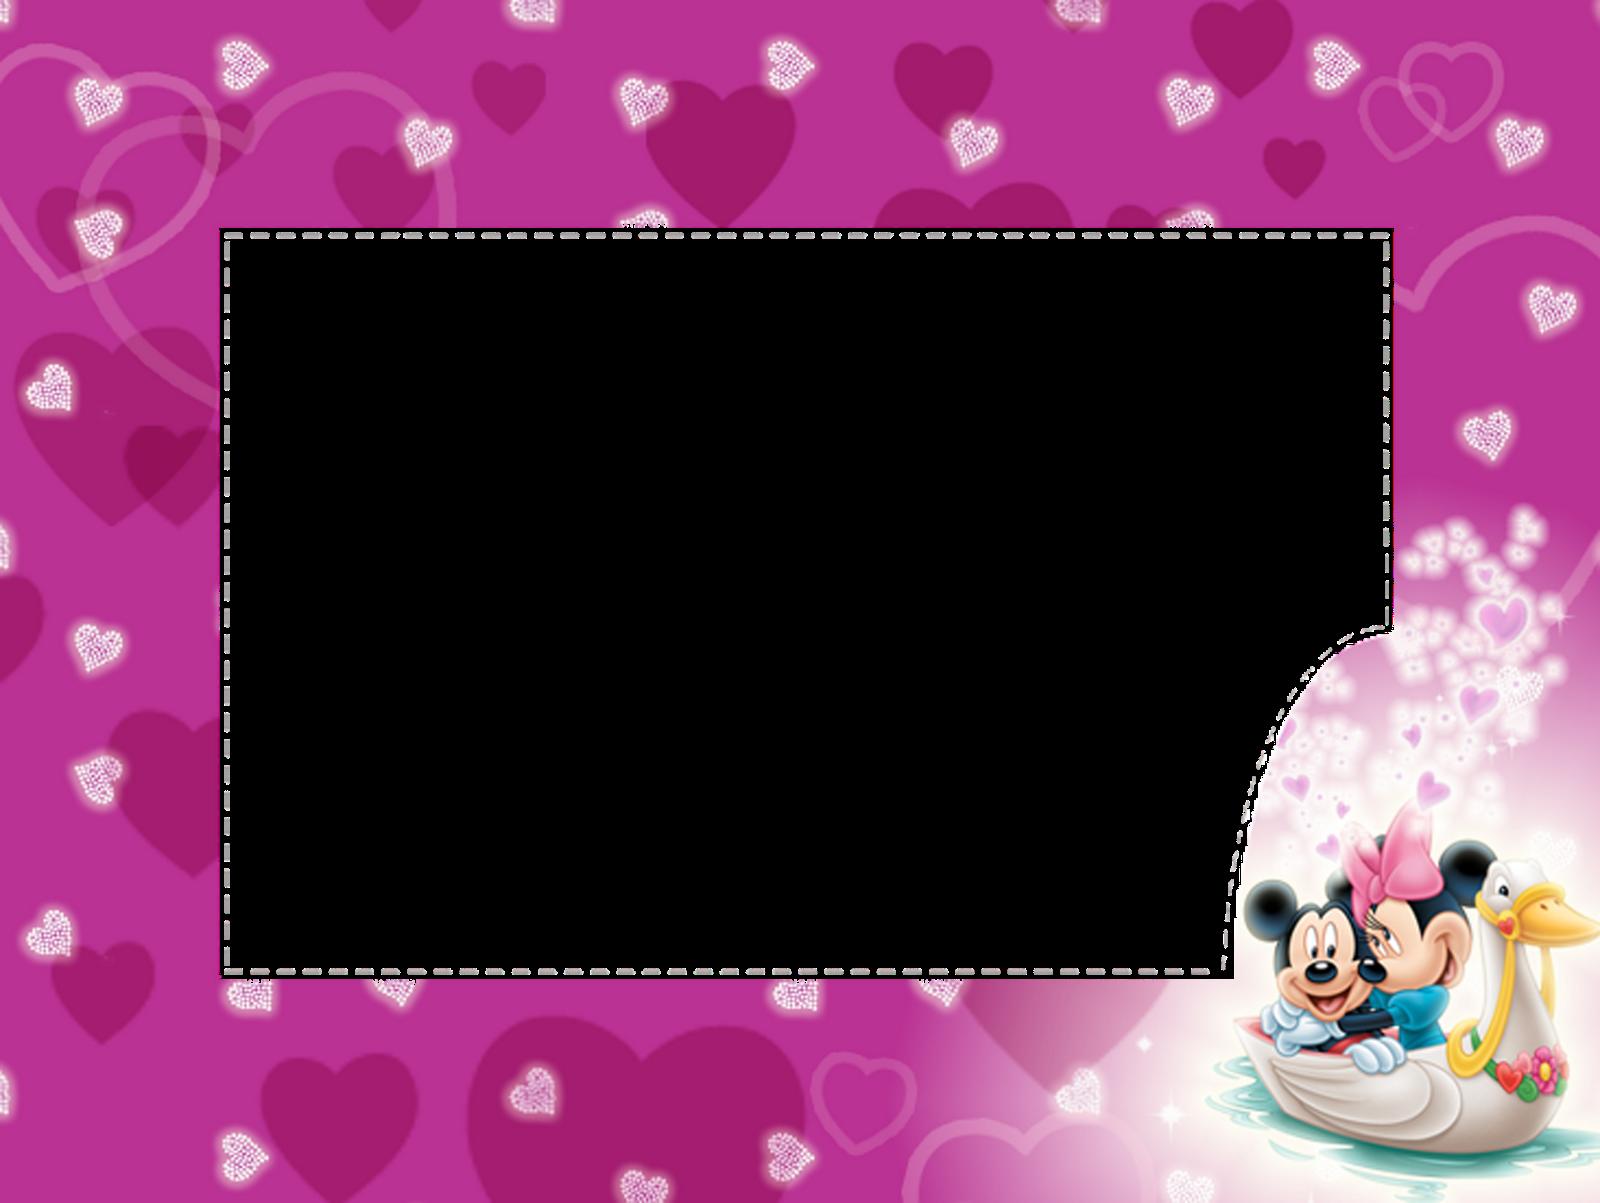 Marcos Para Fotos Infantiles   Disney